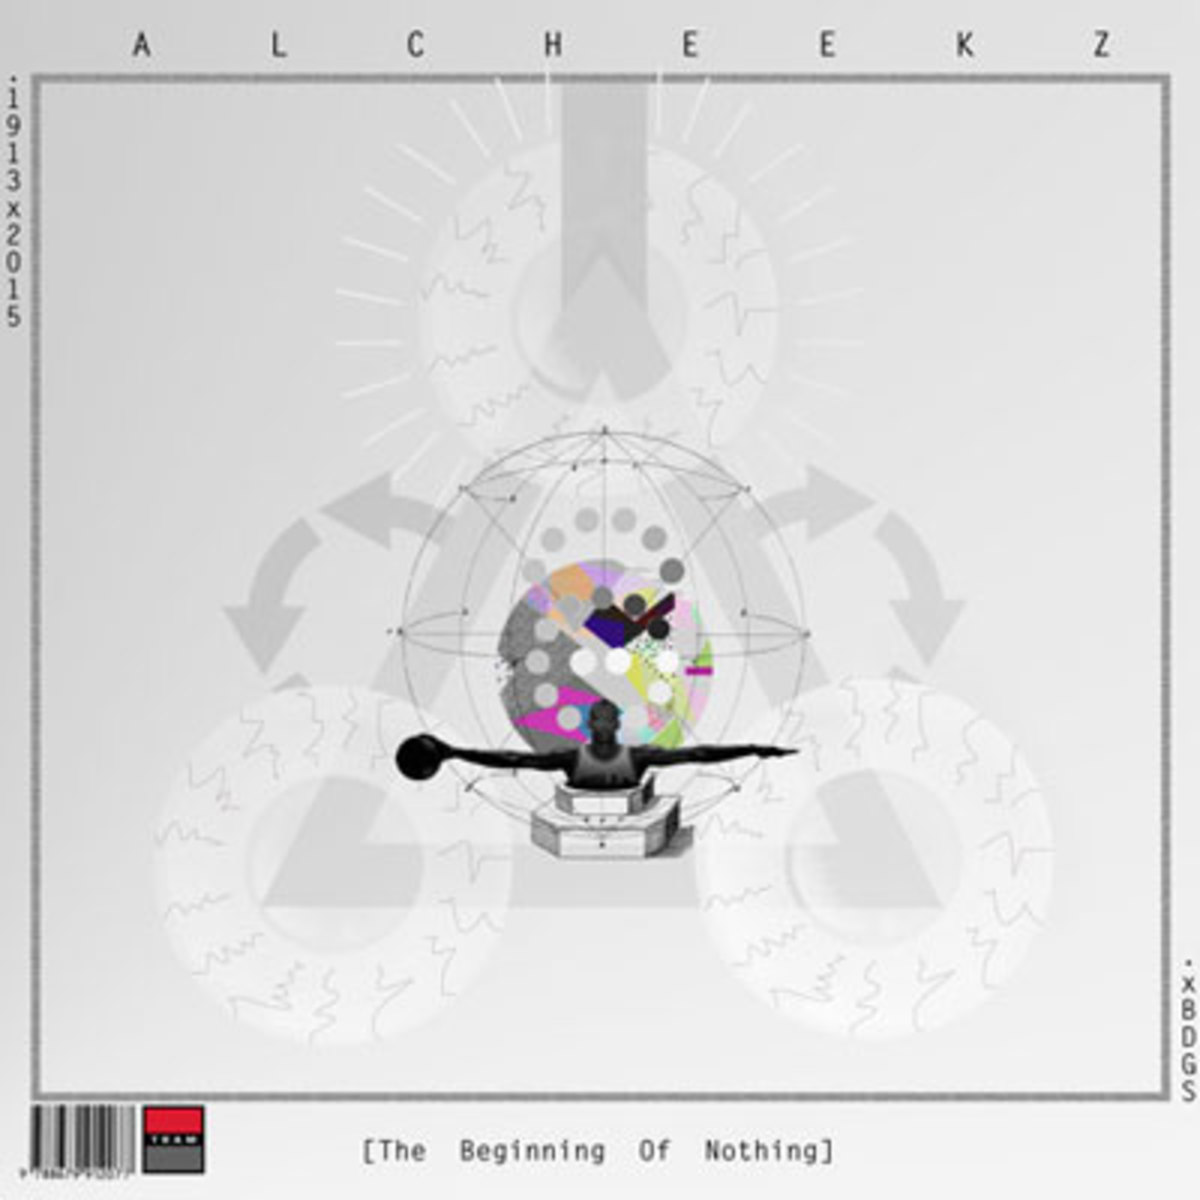 al-cheekz-beginning-of-nothing.jpg